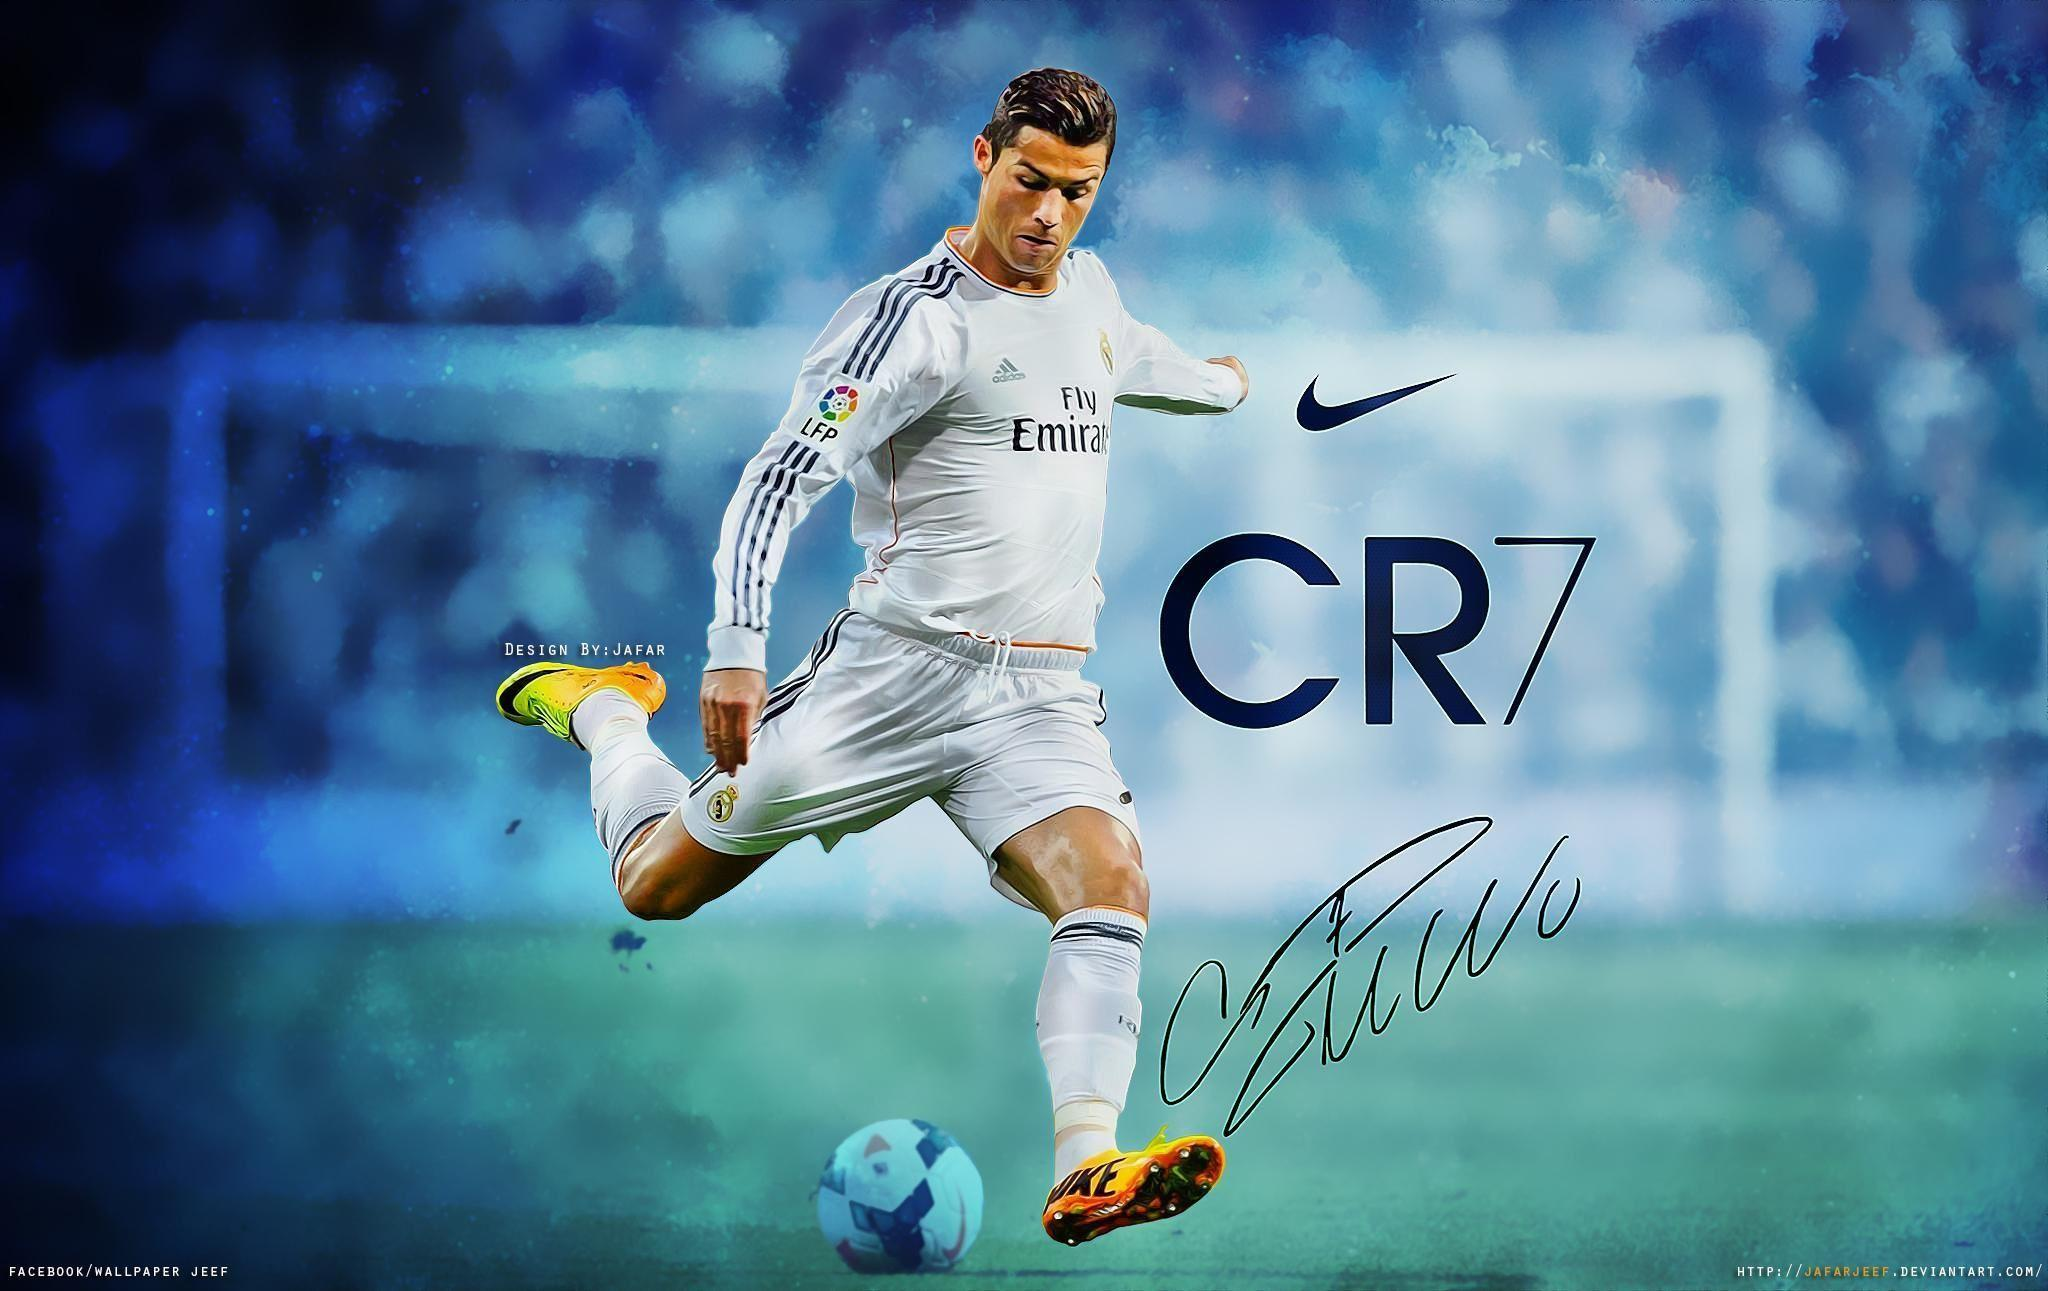 Cristiano Ronaldo 7 Wallpapers 2015 2048x1291